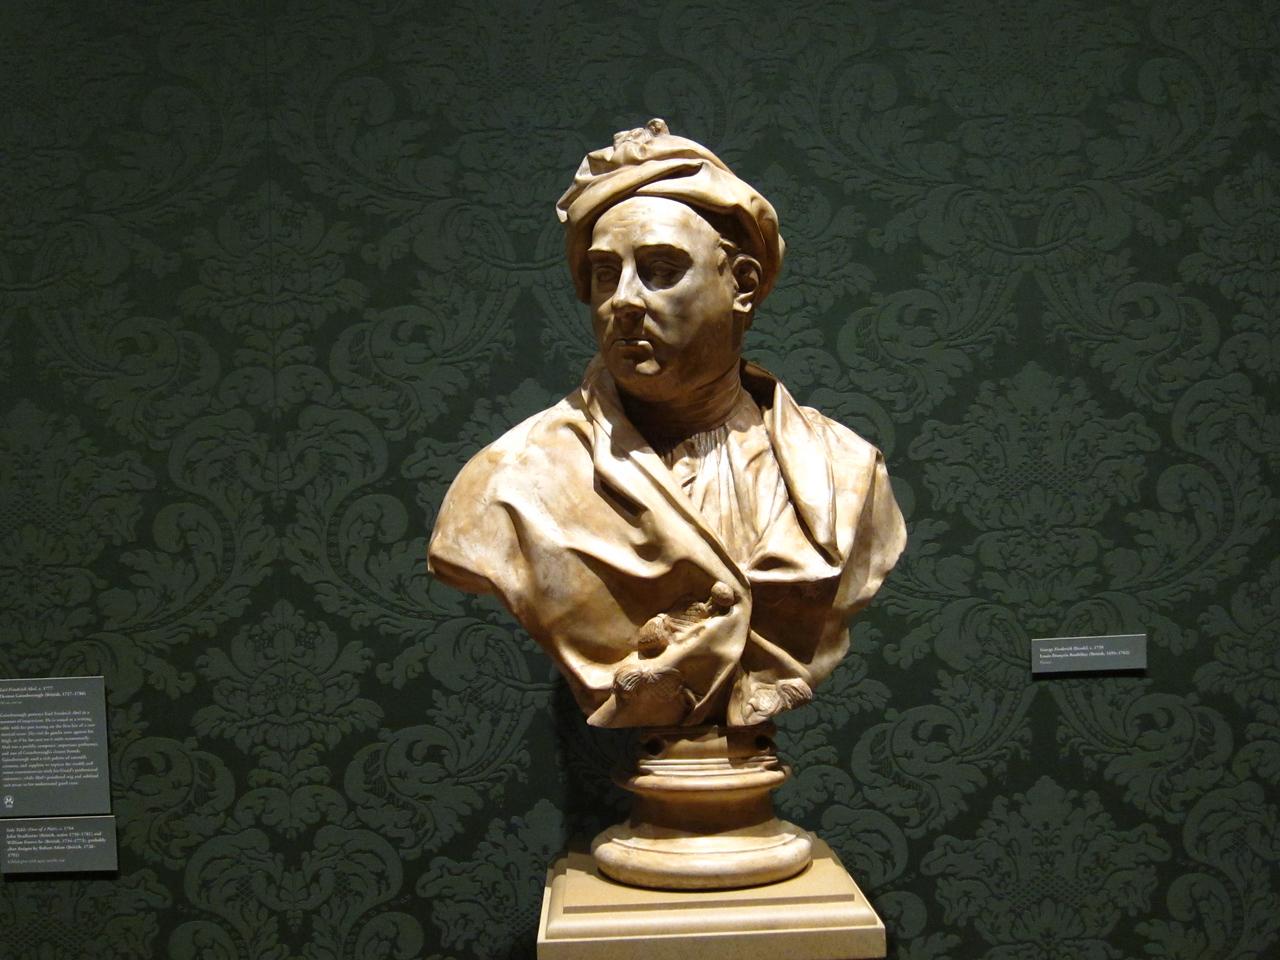 090 George Friedrich Handel